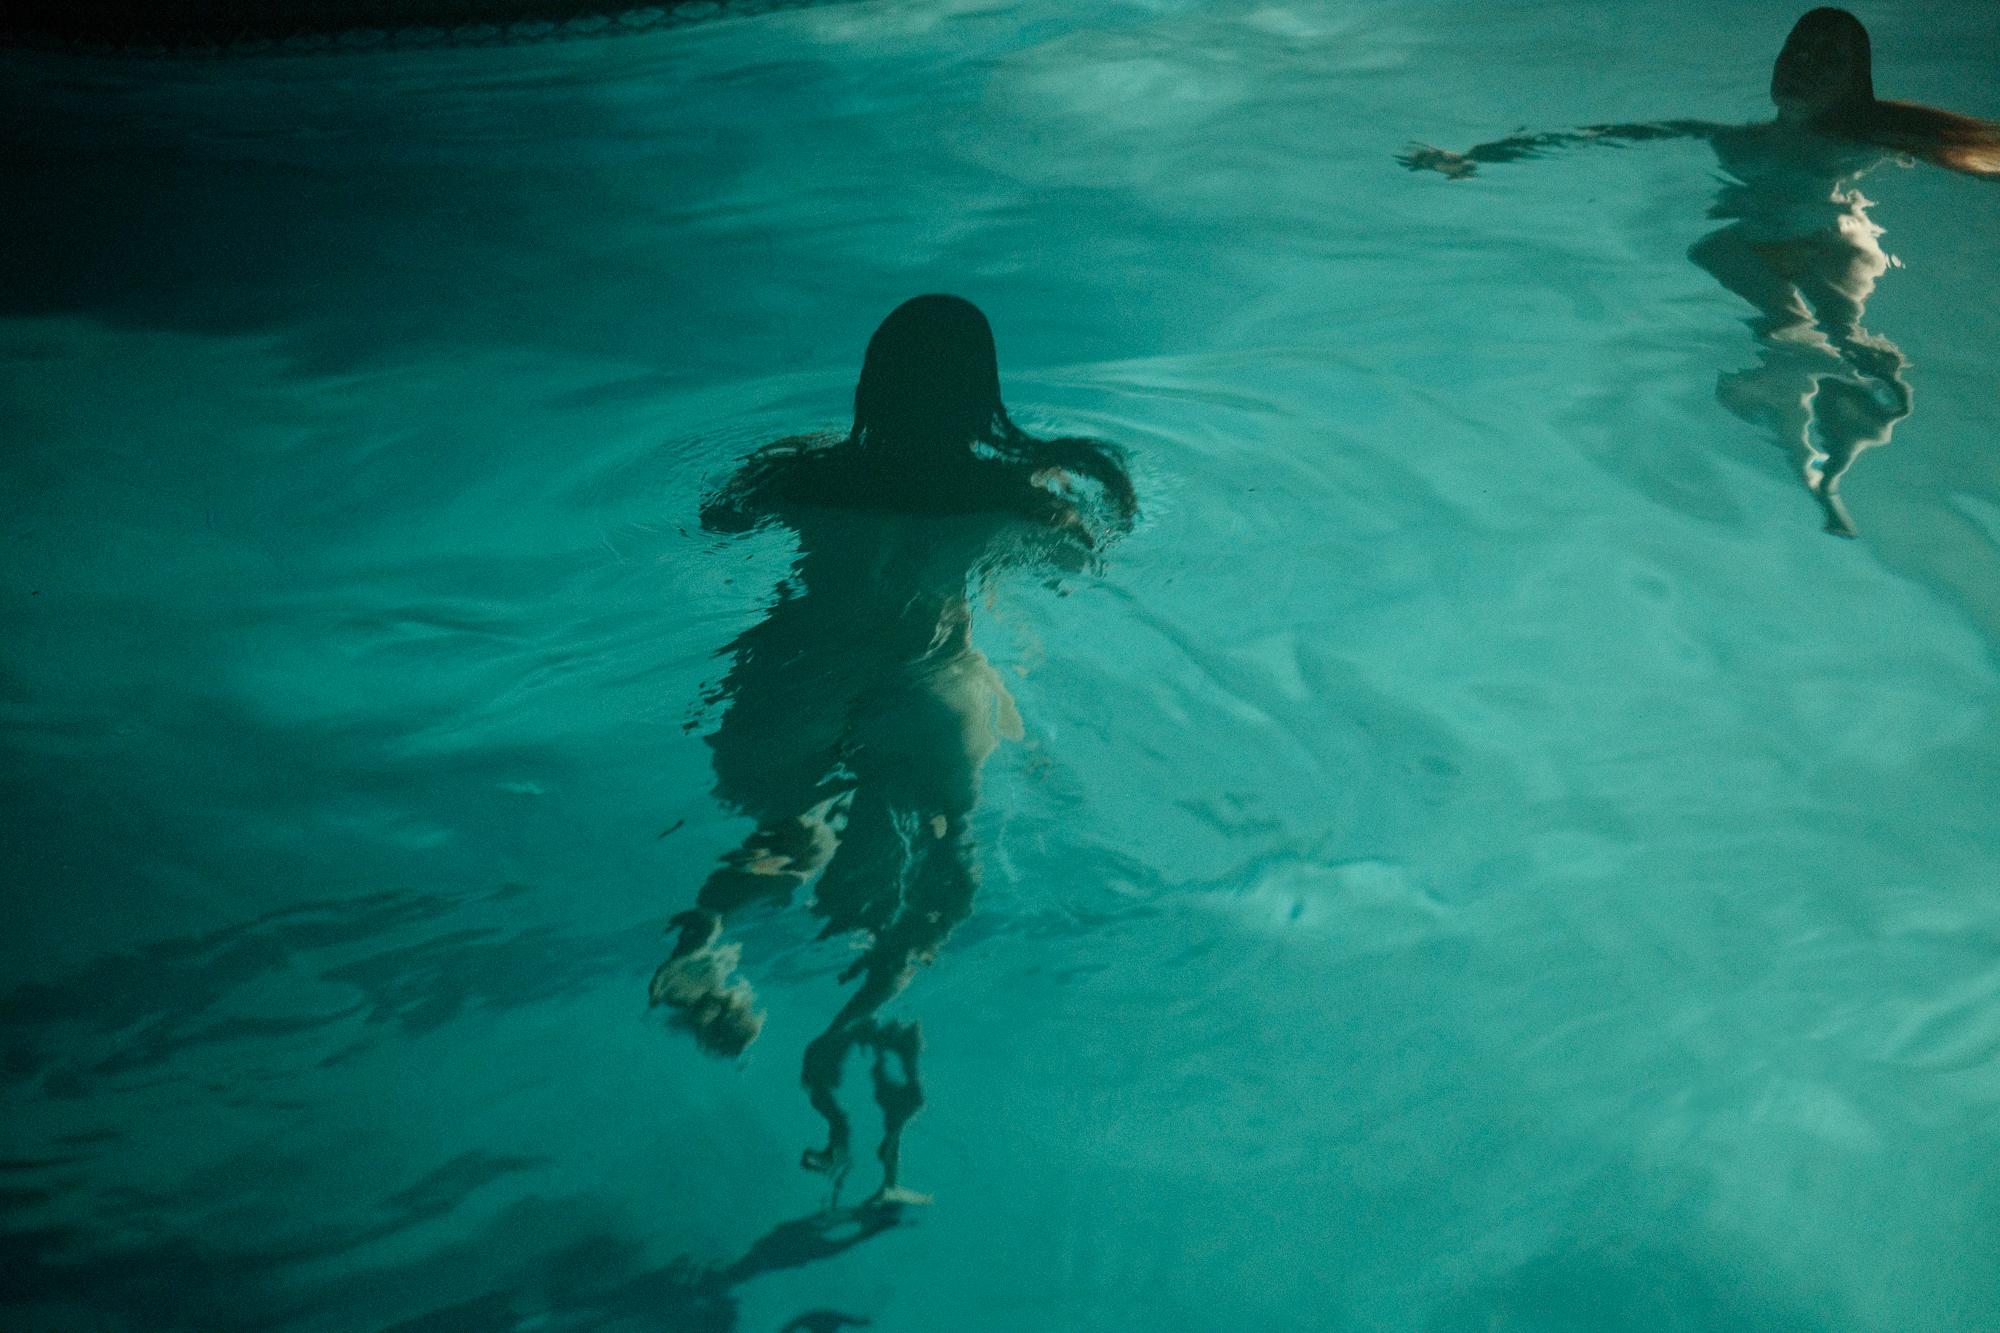 20170619-Ariane-Cassidy-Hannah-swimming-pool-X-Pro2-0296-Edit.jpg